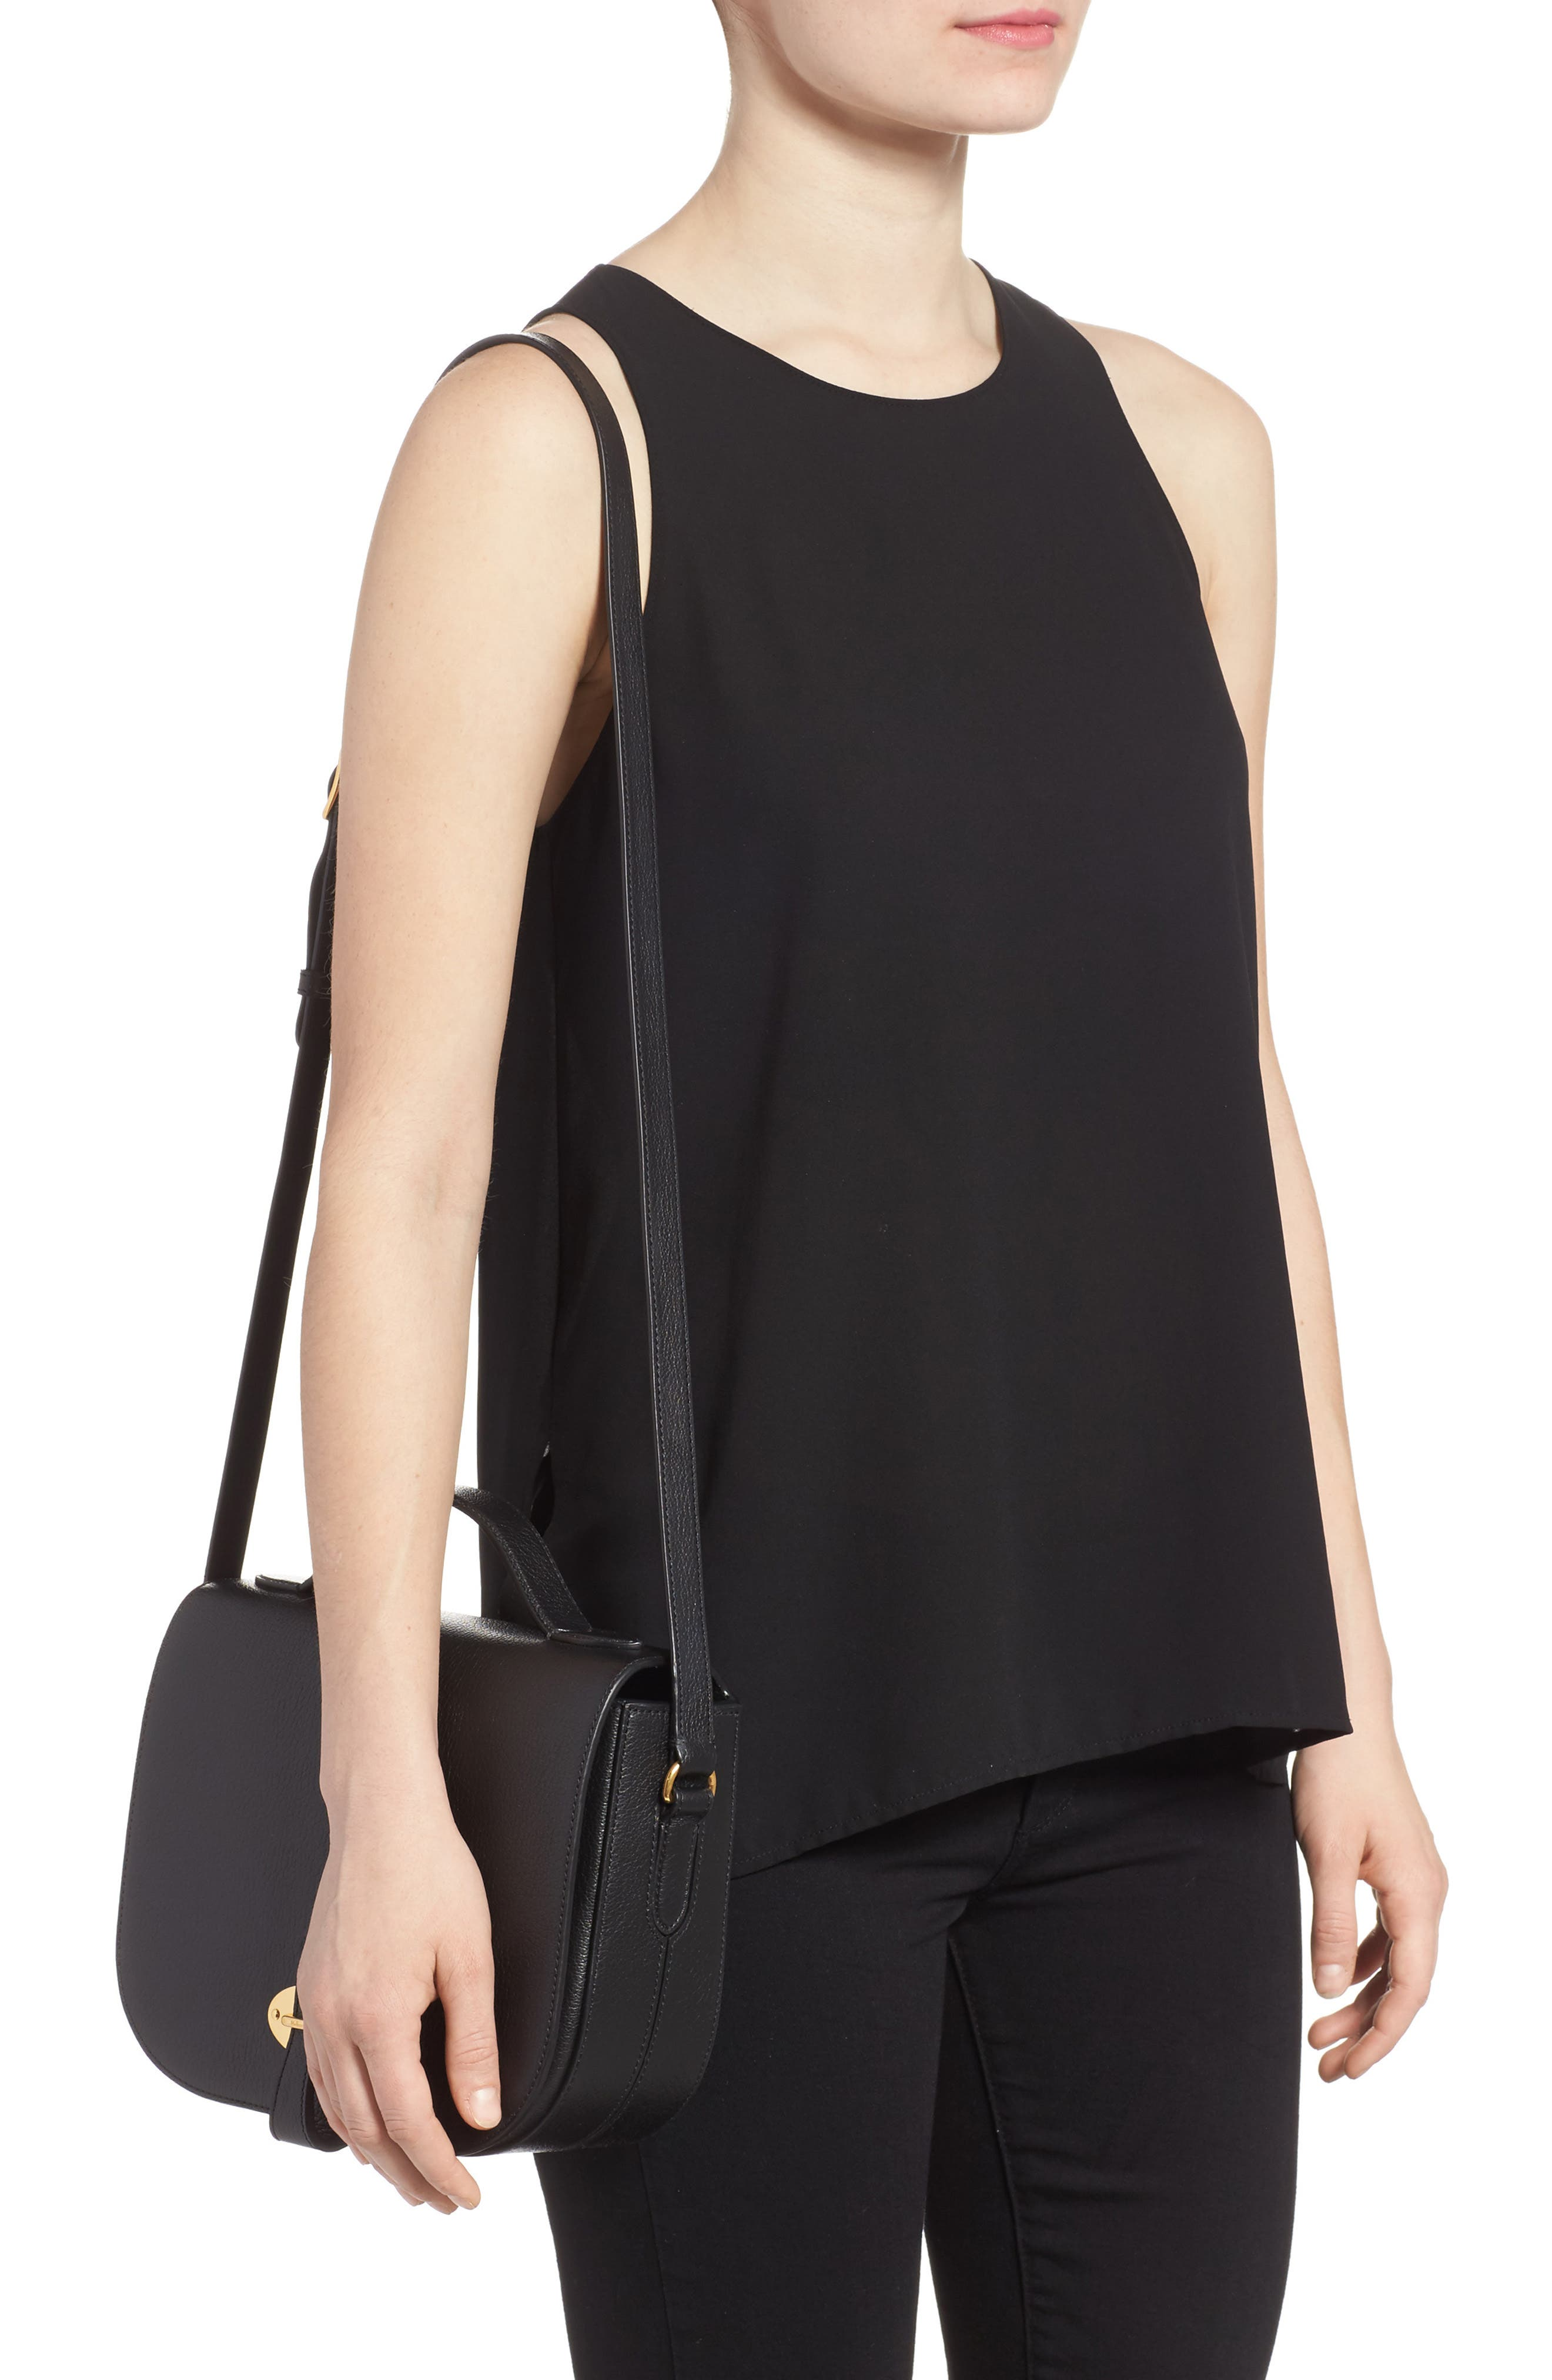 Tenby Calfskin Leather Crossbody Bag,                             Alternate thumbnail 2, color,                             001